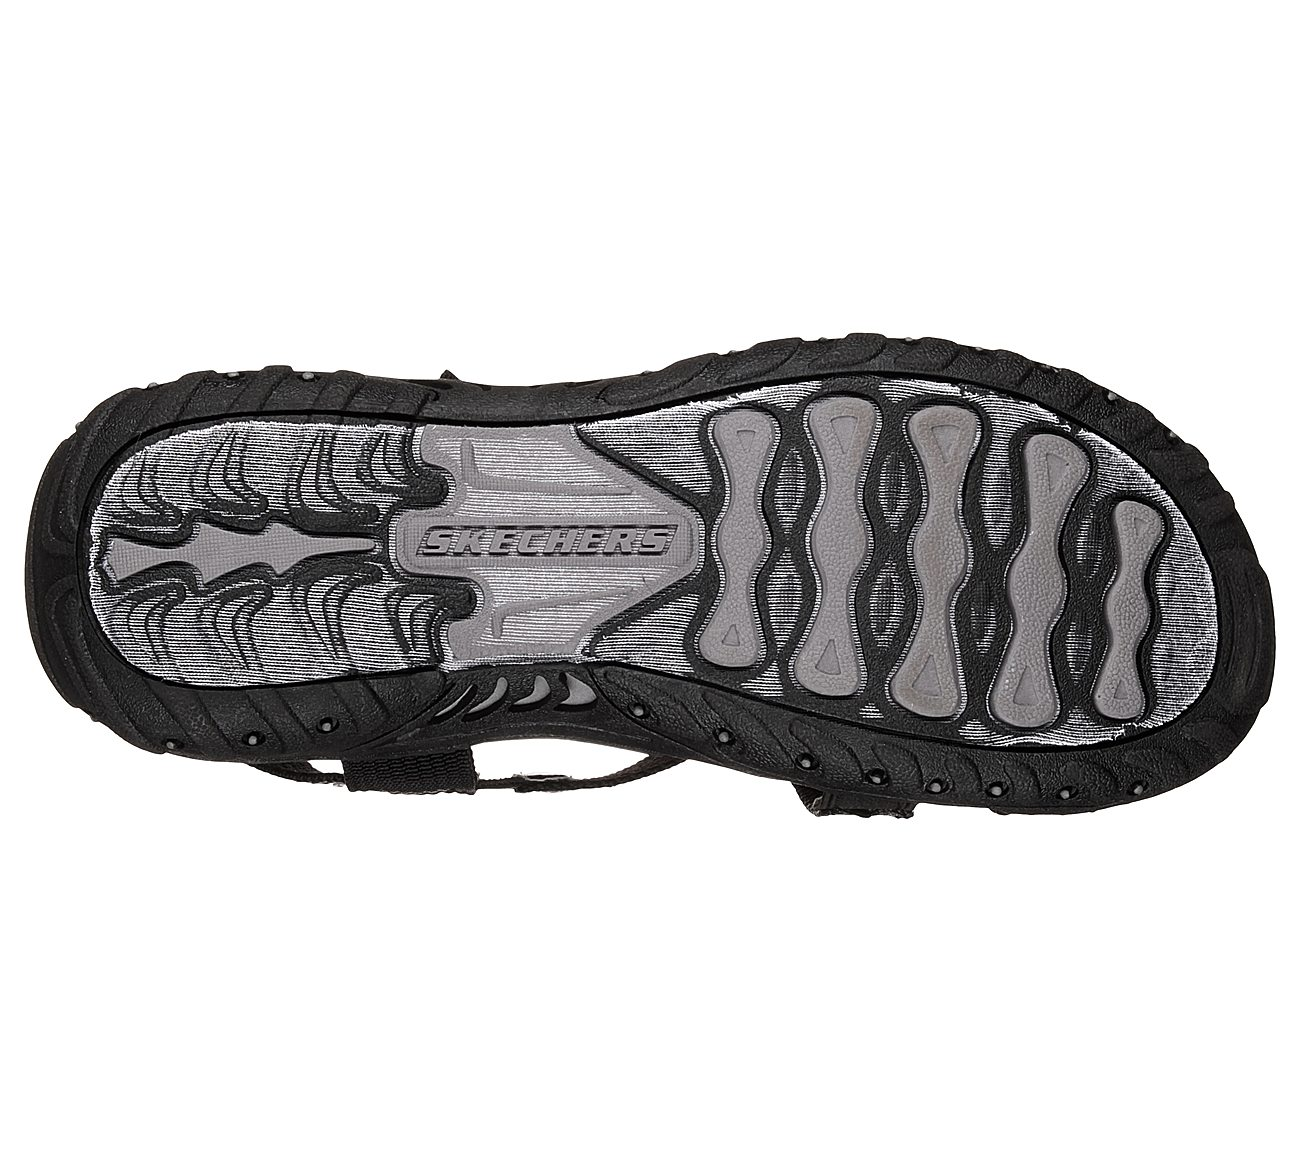 341db694a17f Buy SKECHERS Reggae - Kooky Modern Comfort Shoes only  31.50